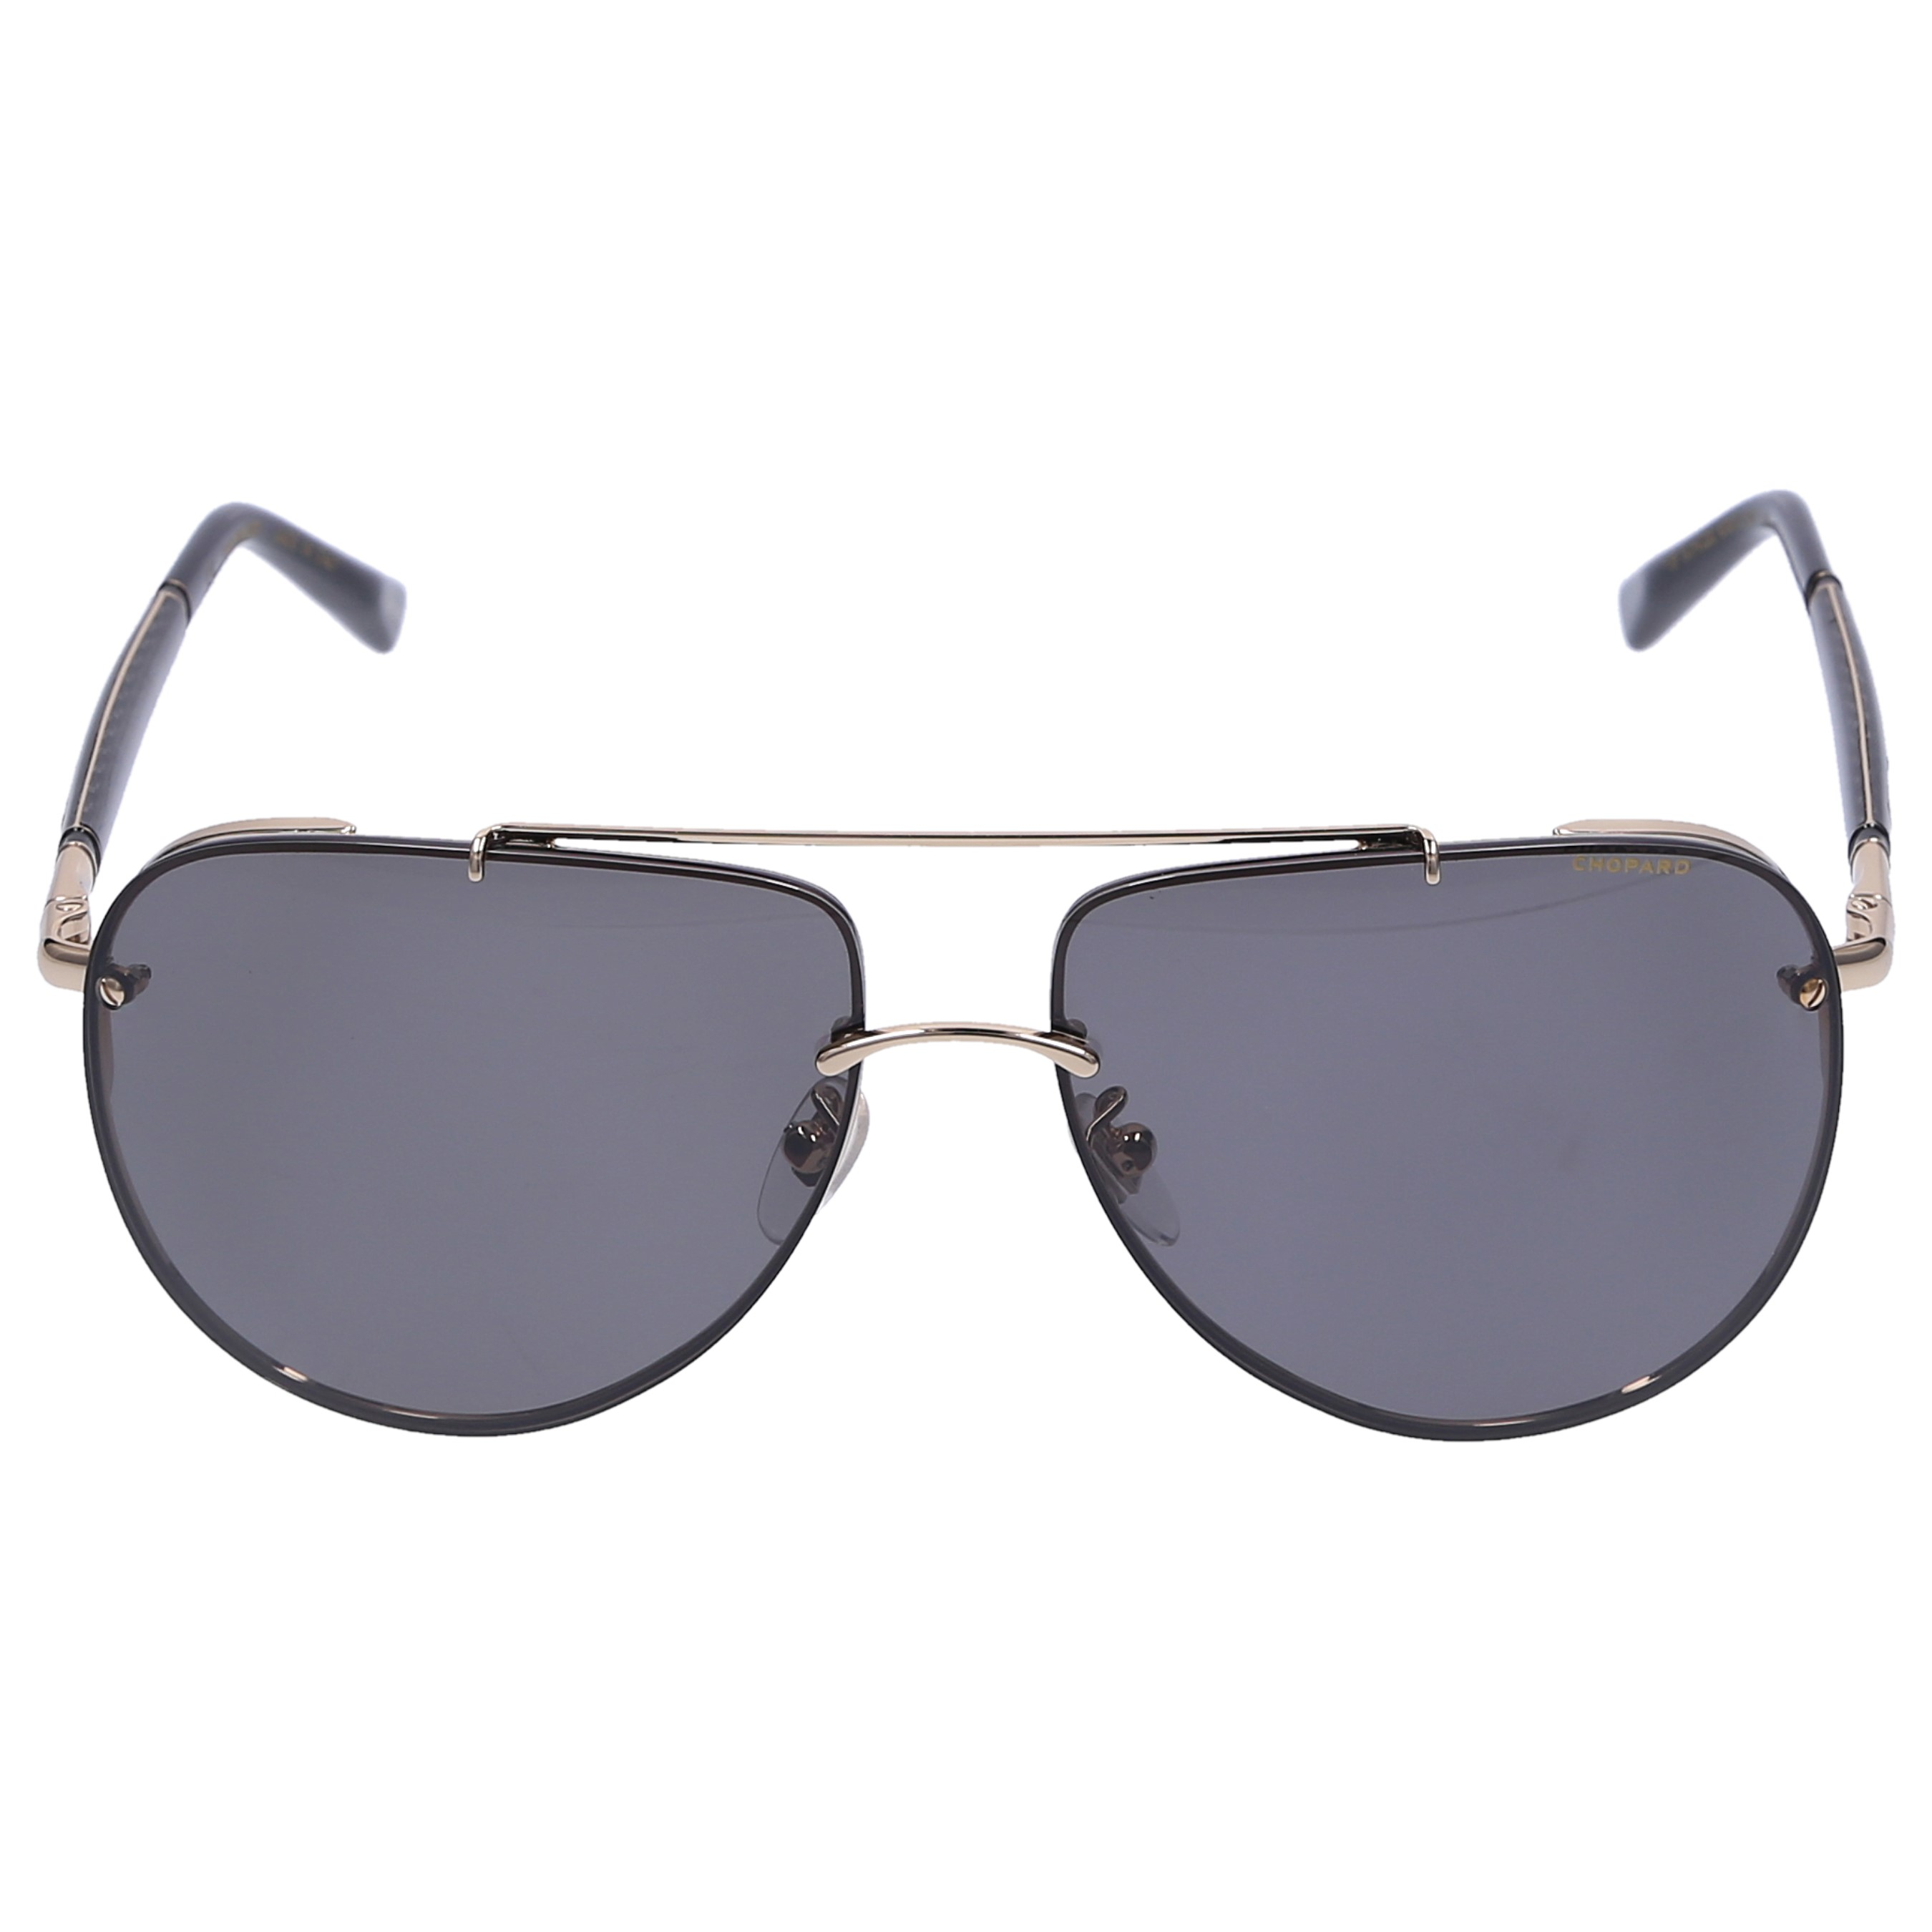 Chopard Sonnenbrille Aviator SCH28 301Z Carbon gold